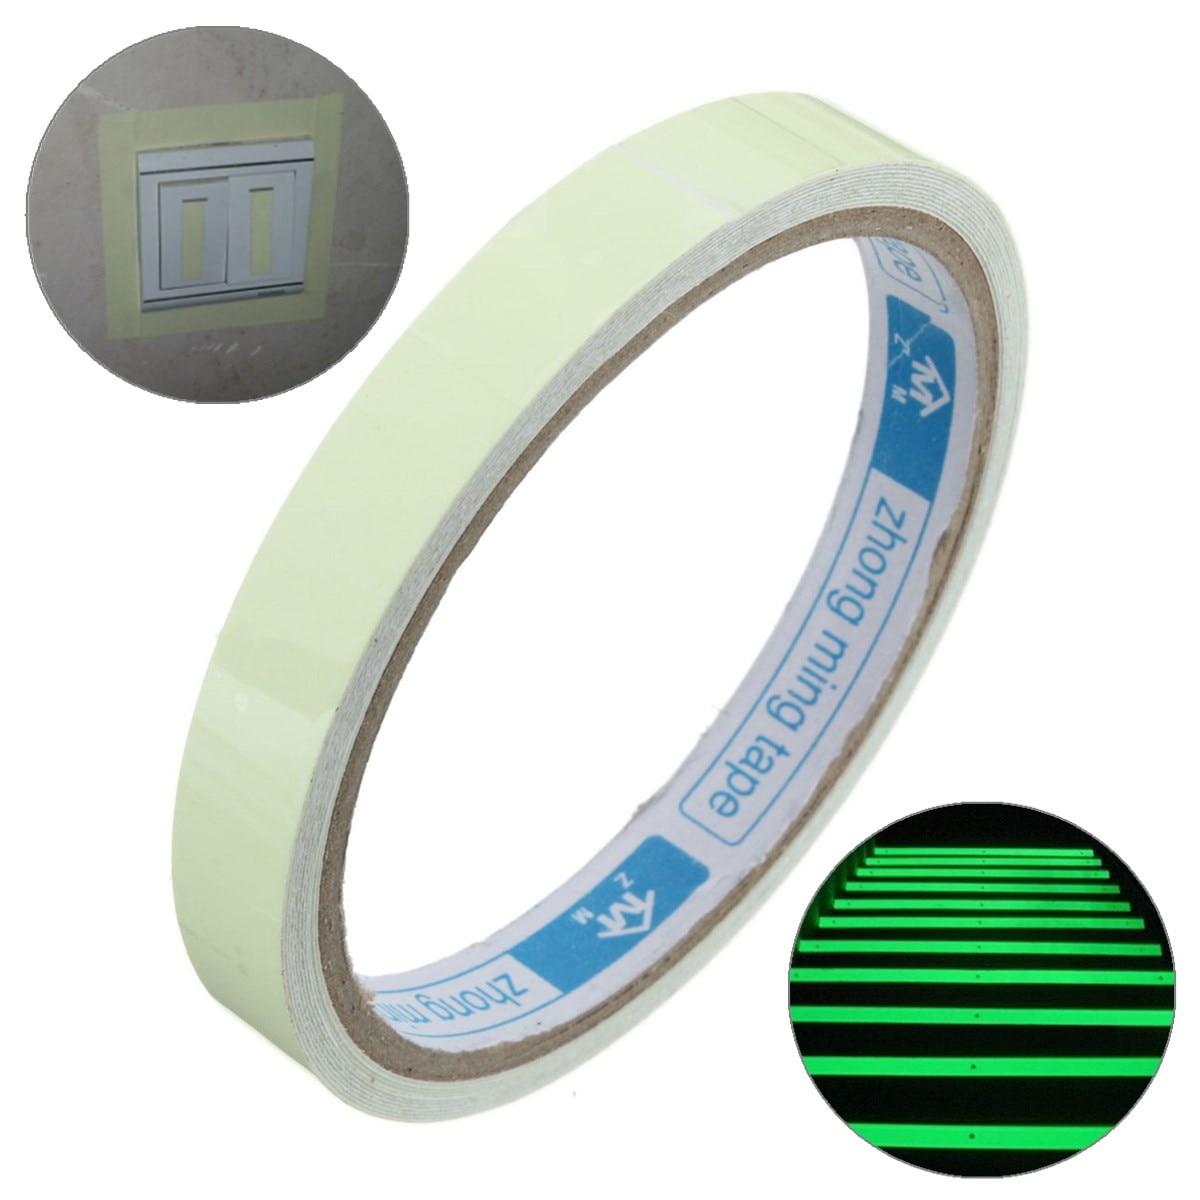 3m-10-15-20mm-green-luminous-tape-glow-in-the-dark-self-adhesive-warning-security